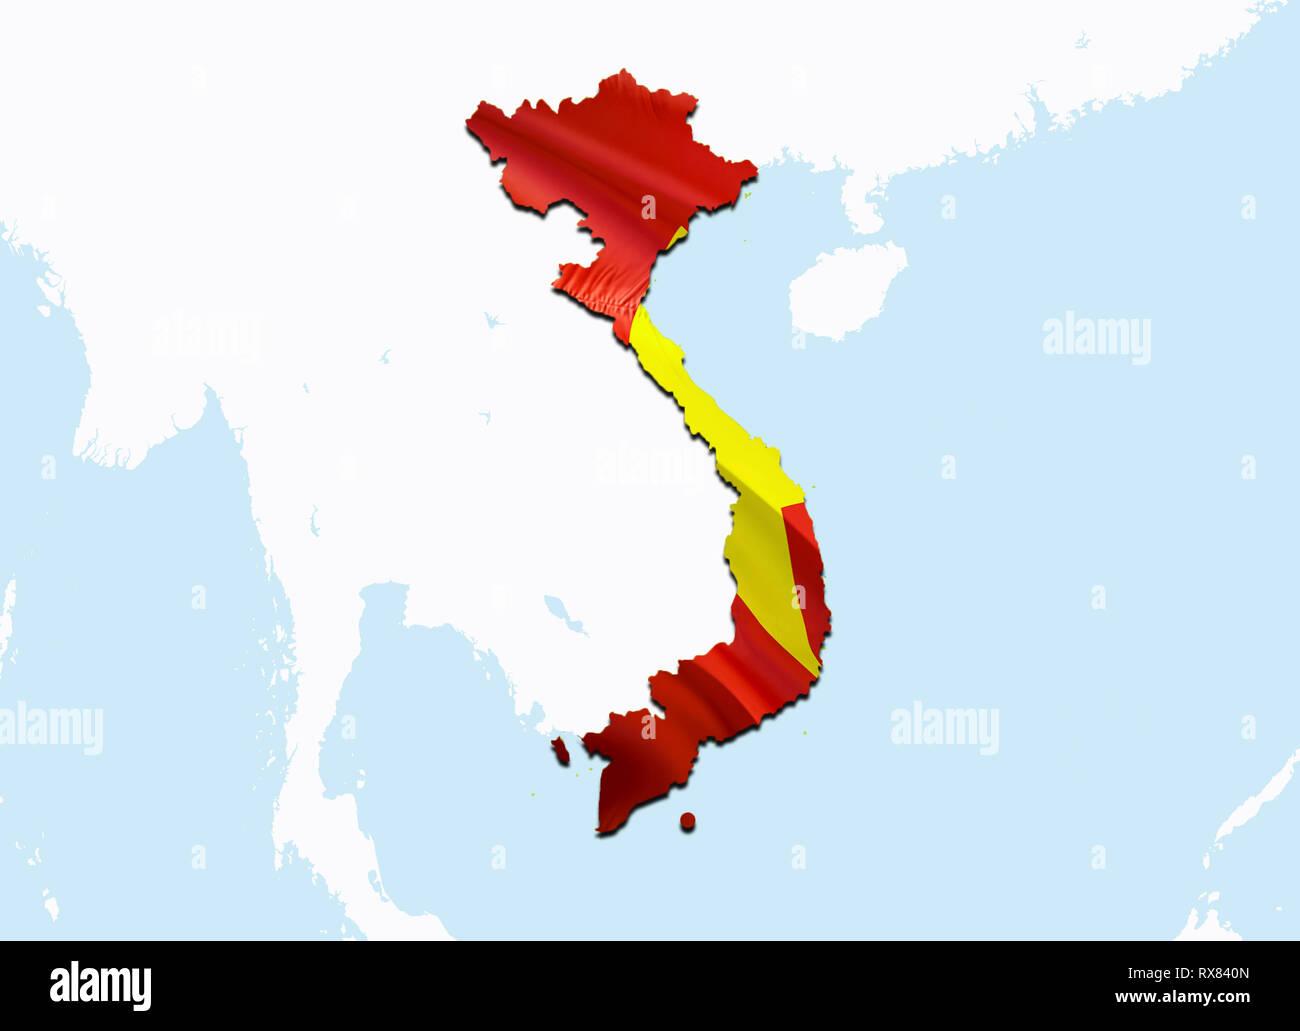 Ha Noi Vietnam Map.Flag Map Of Vietnam 3d Rendering Vietnam Map And Flag On Asia Map